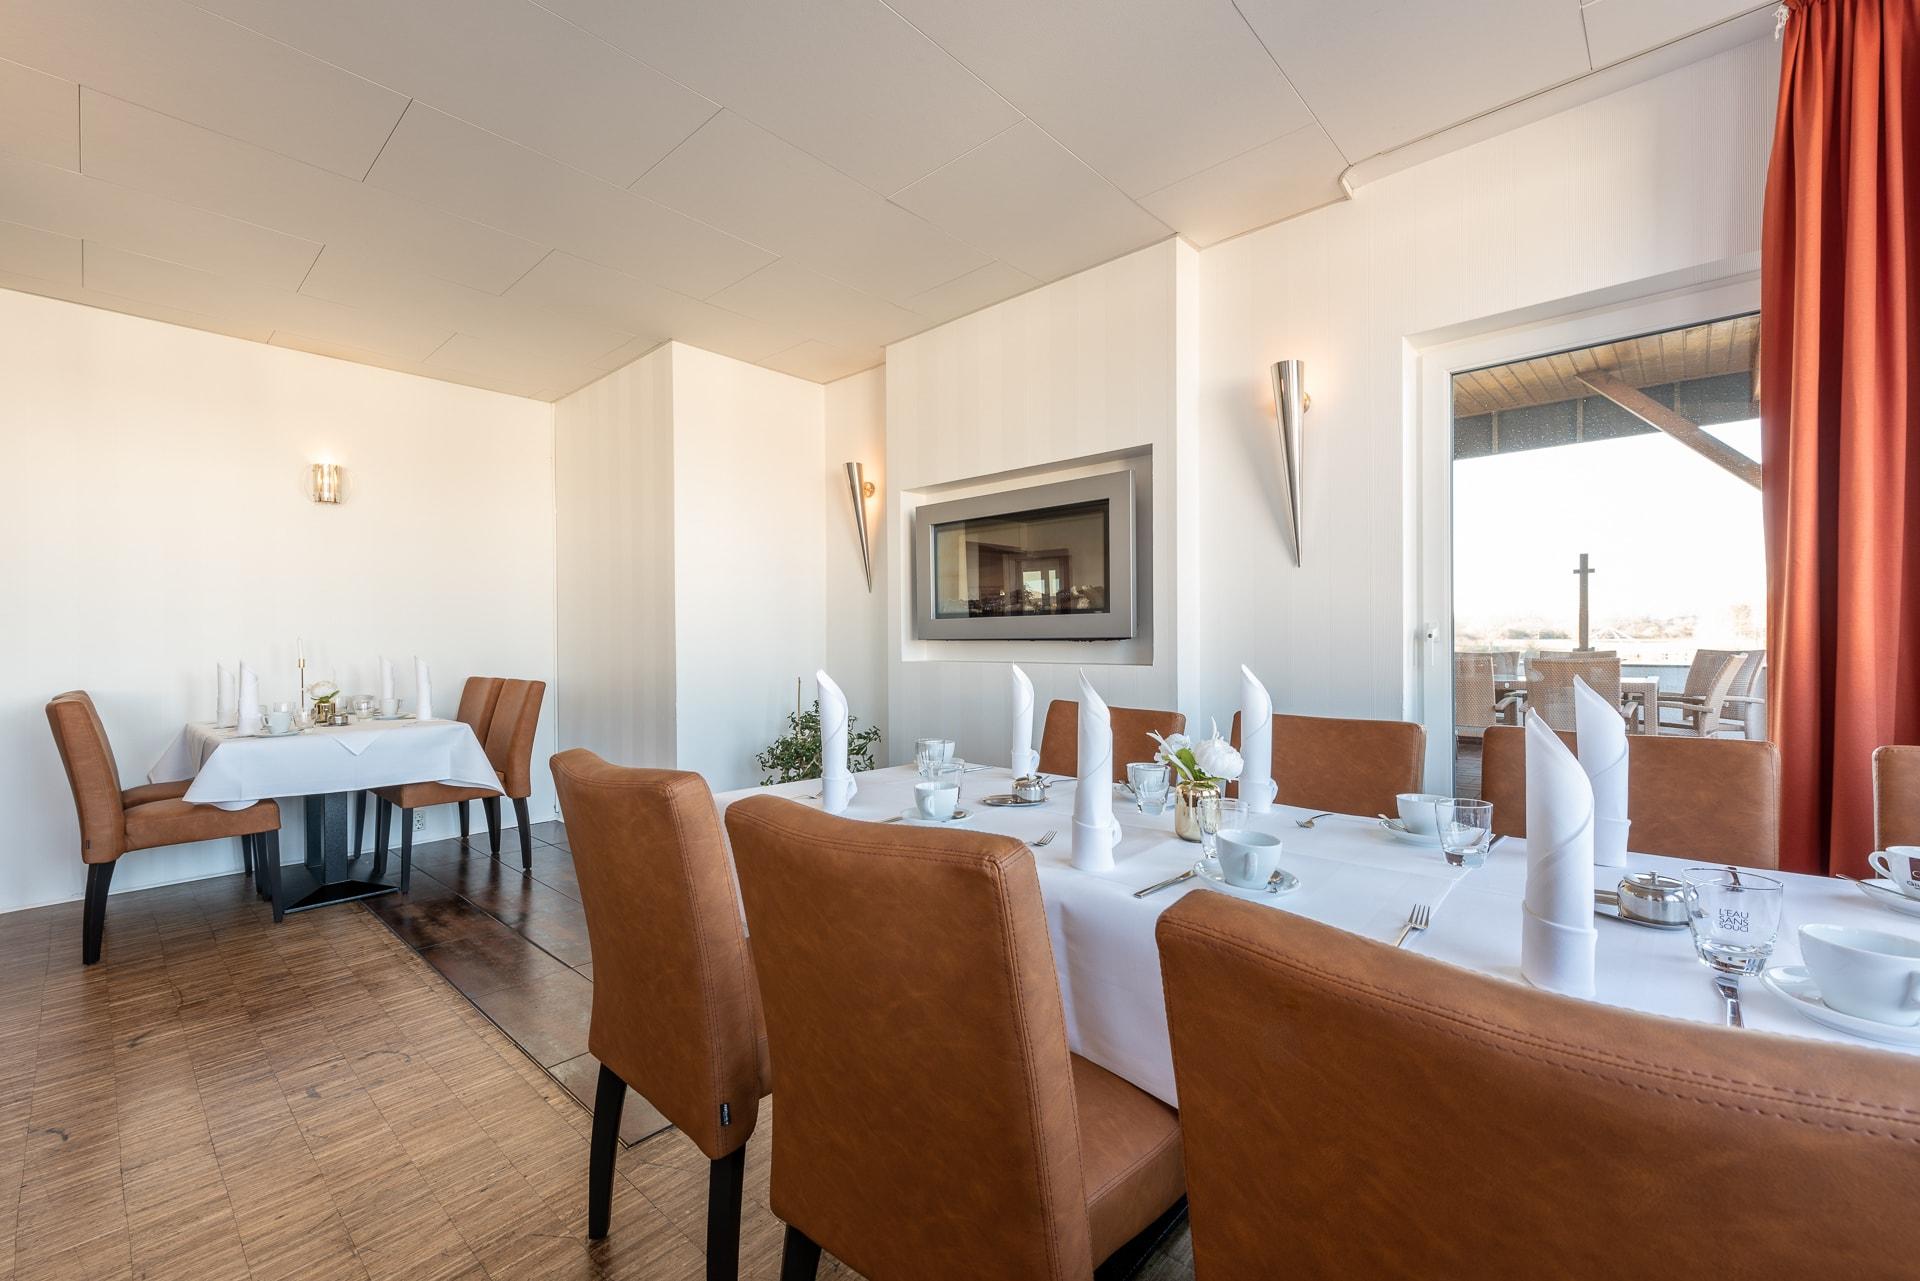 Restaurant Seeterrasse Salzgitter Interior - © Daniel Salinger